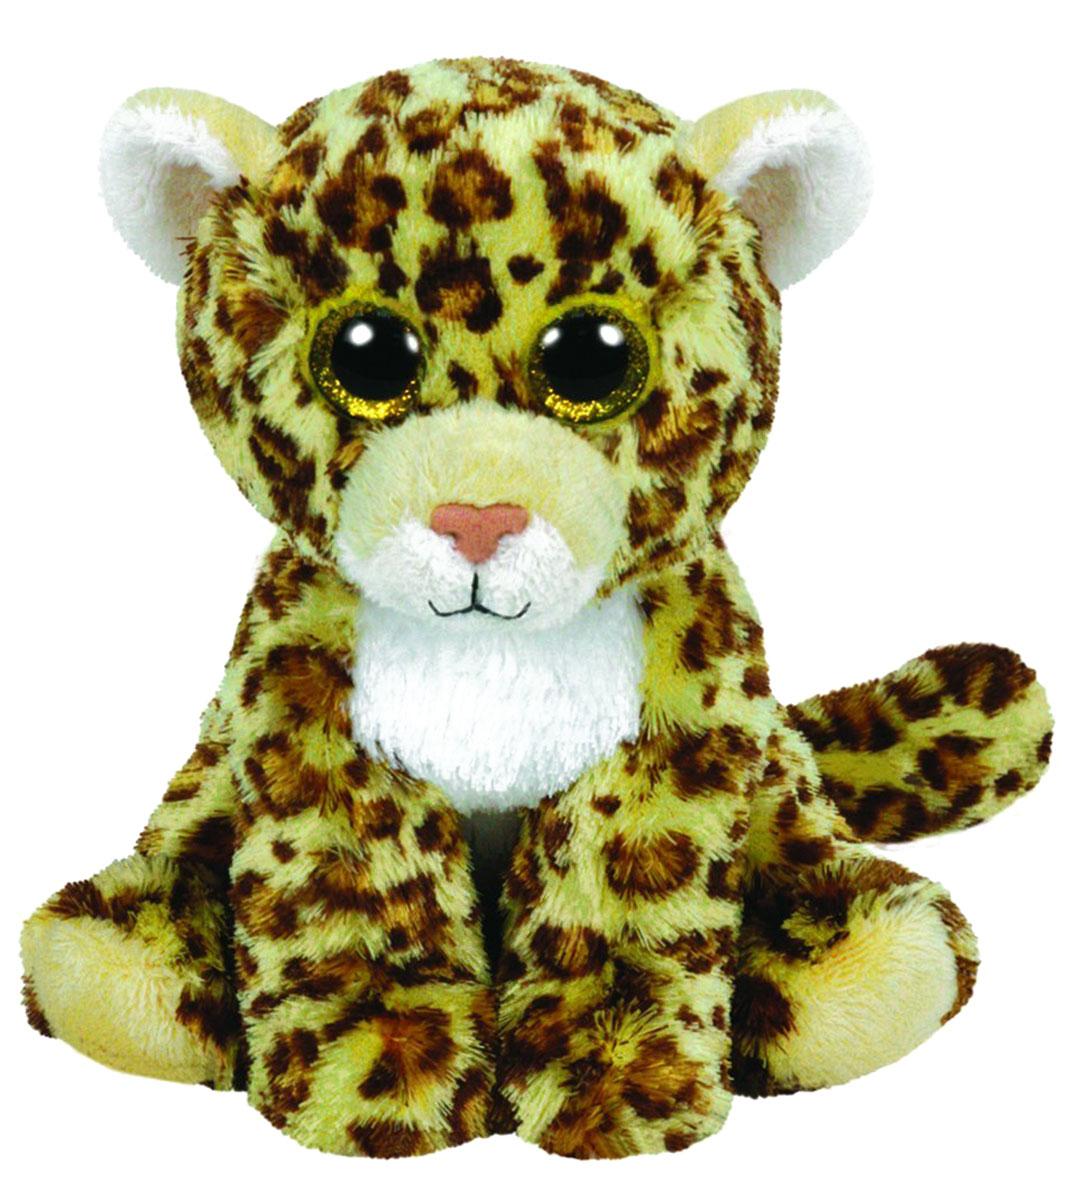 TY Мягкая игрушка Леопард Spotty 16 см